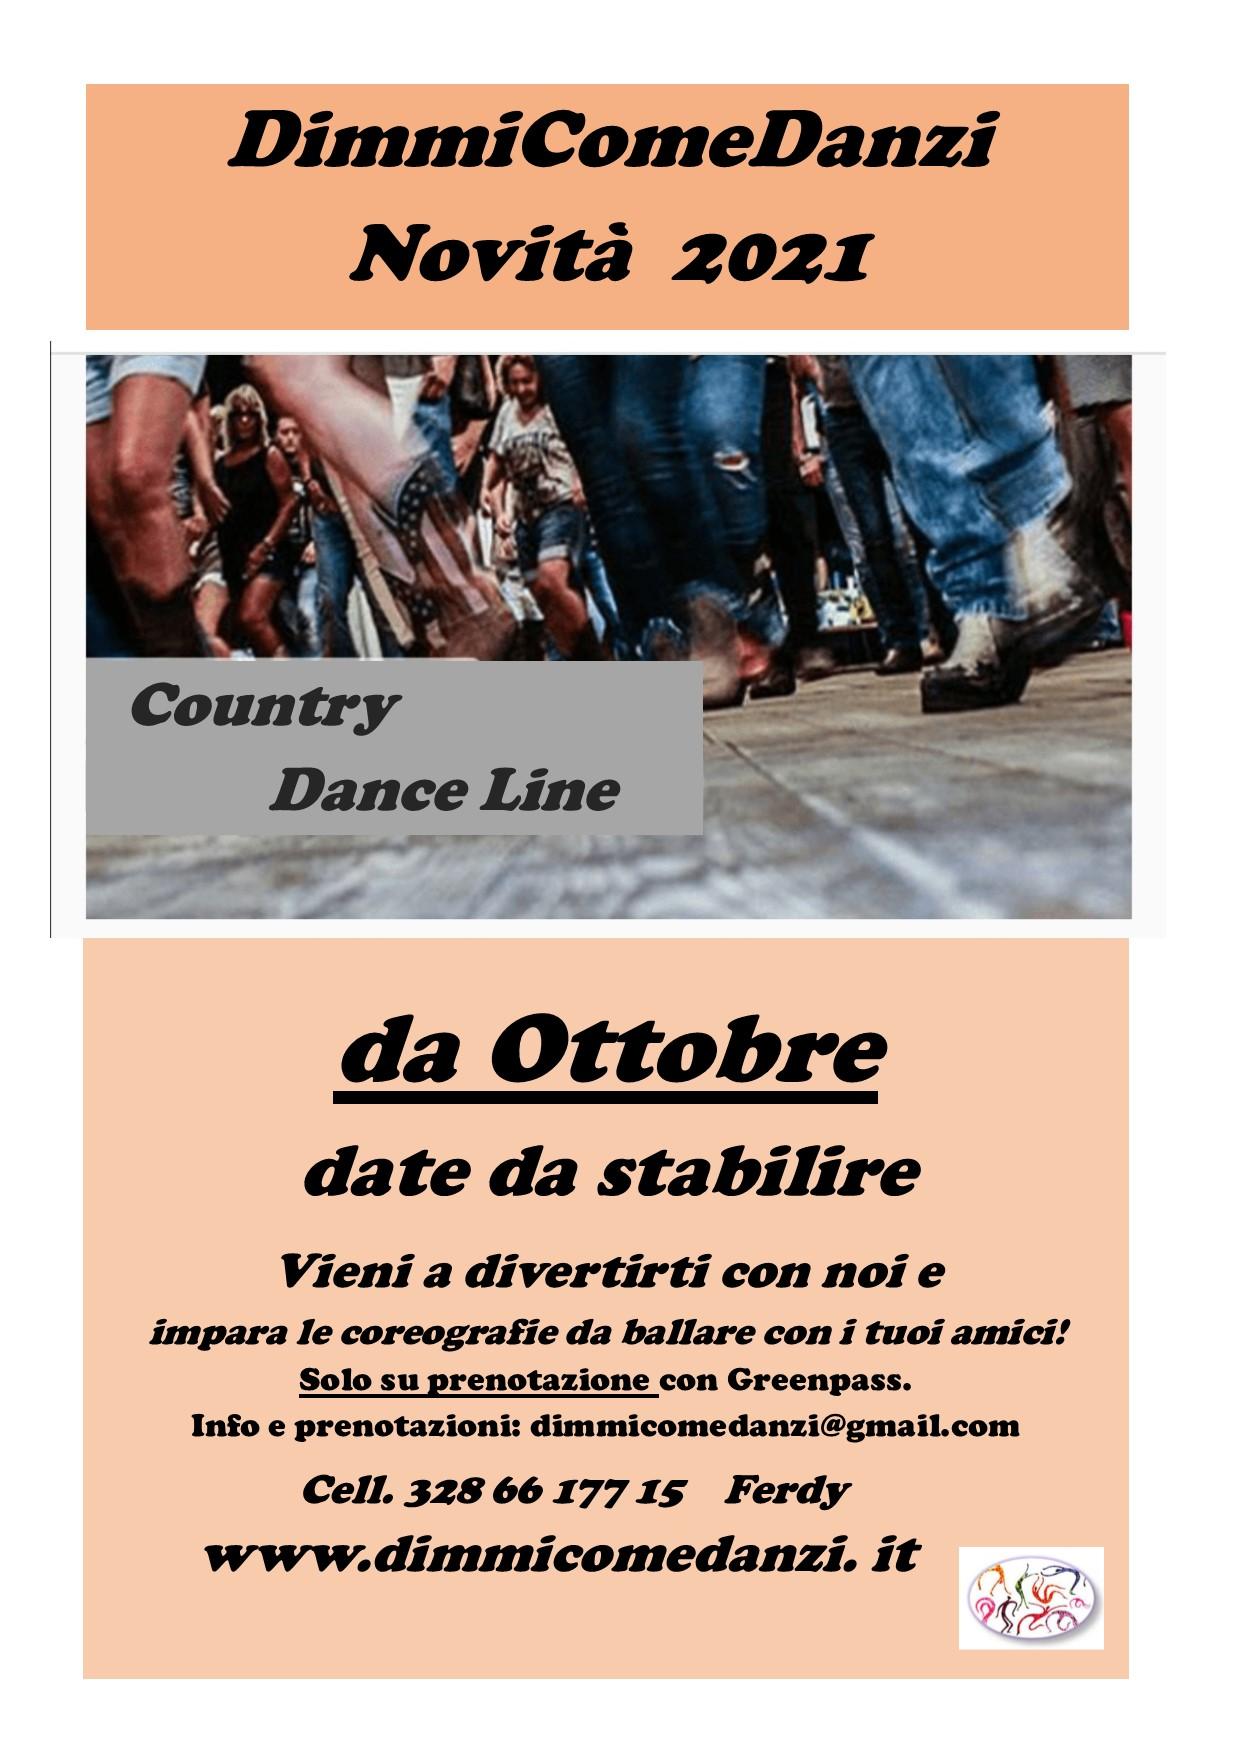 Country Dance Line  www.dimmicomedanzi.it